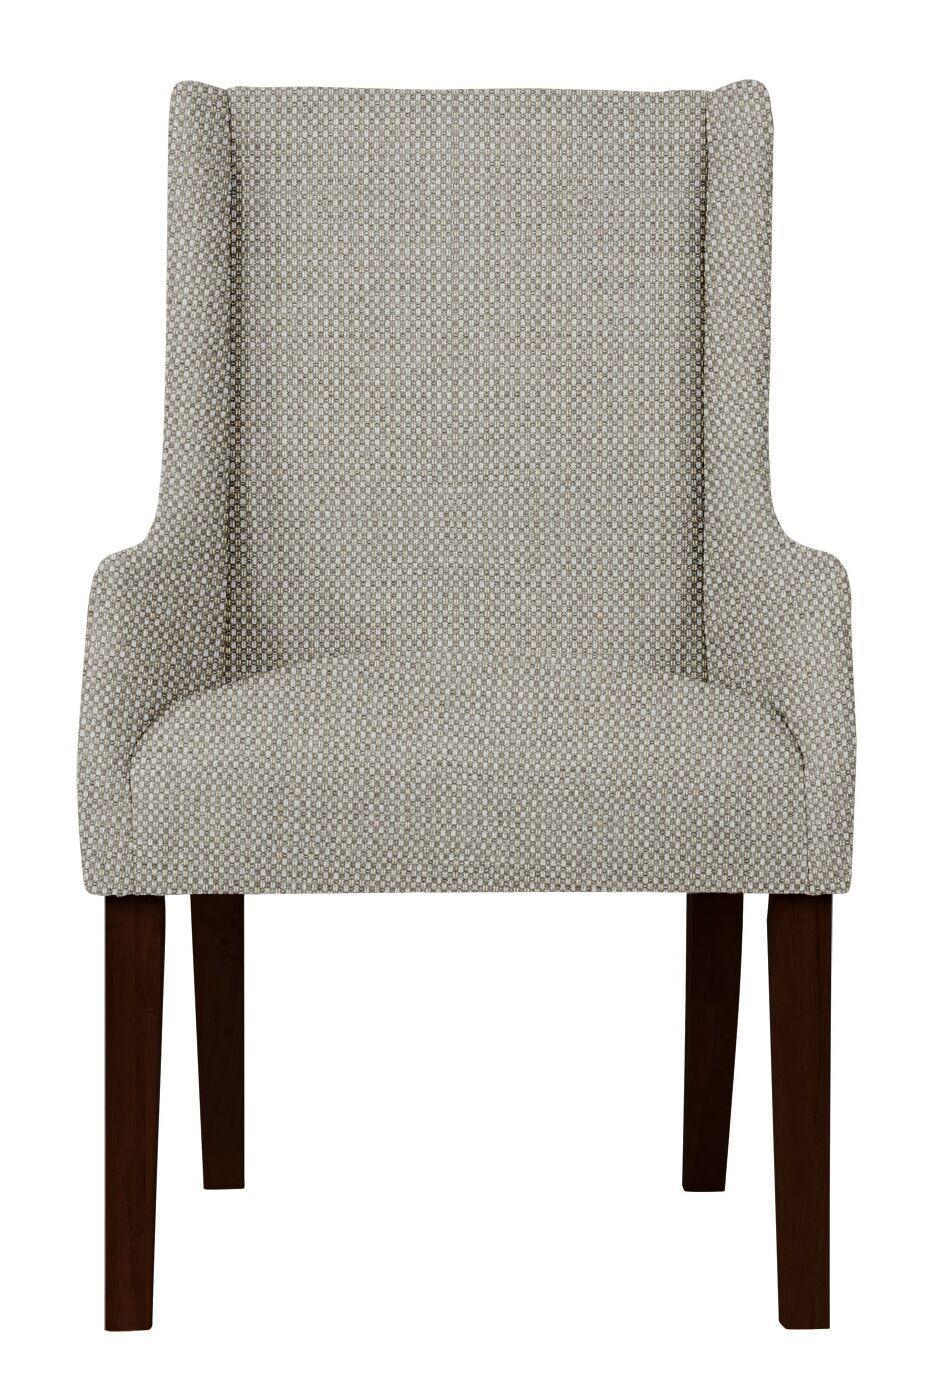 Larrabee Birch Hardwood Framed Arm Chair Upholstery Color: Light Gray